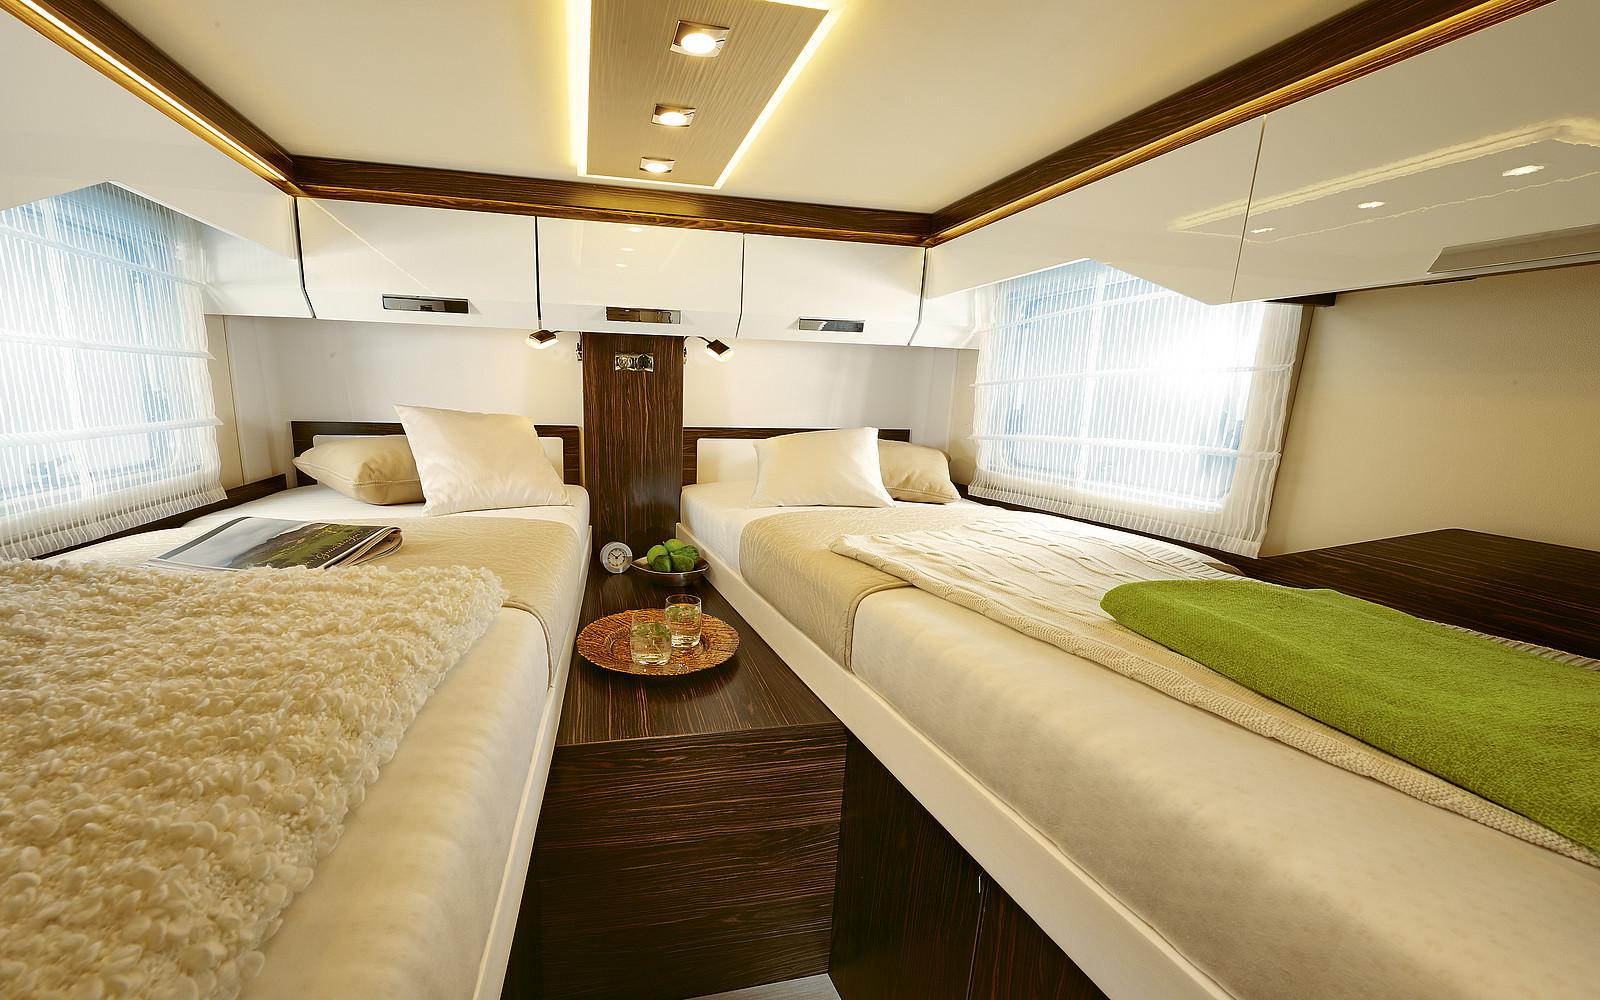 2020 Burstner Elegance Motorhome - Interior - Photo - Rear Twin Single Beds